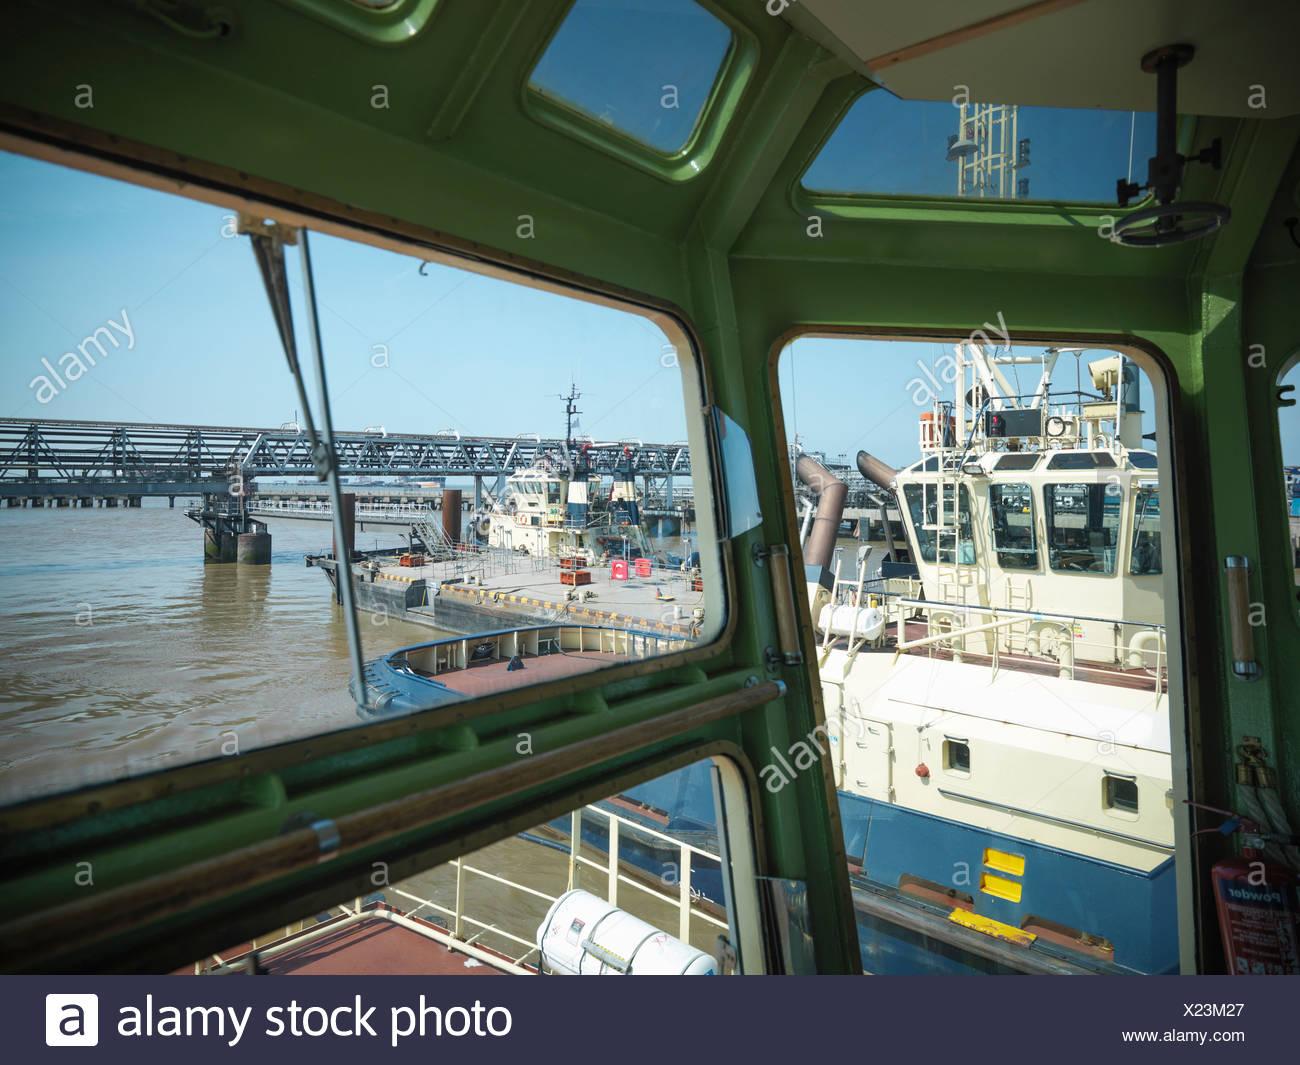 Tugboats in urban harbor - Stock Image